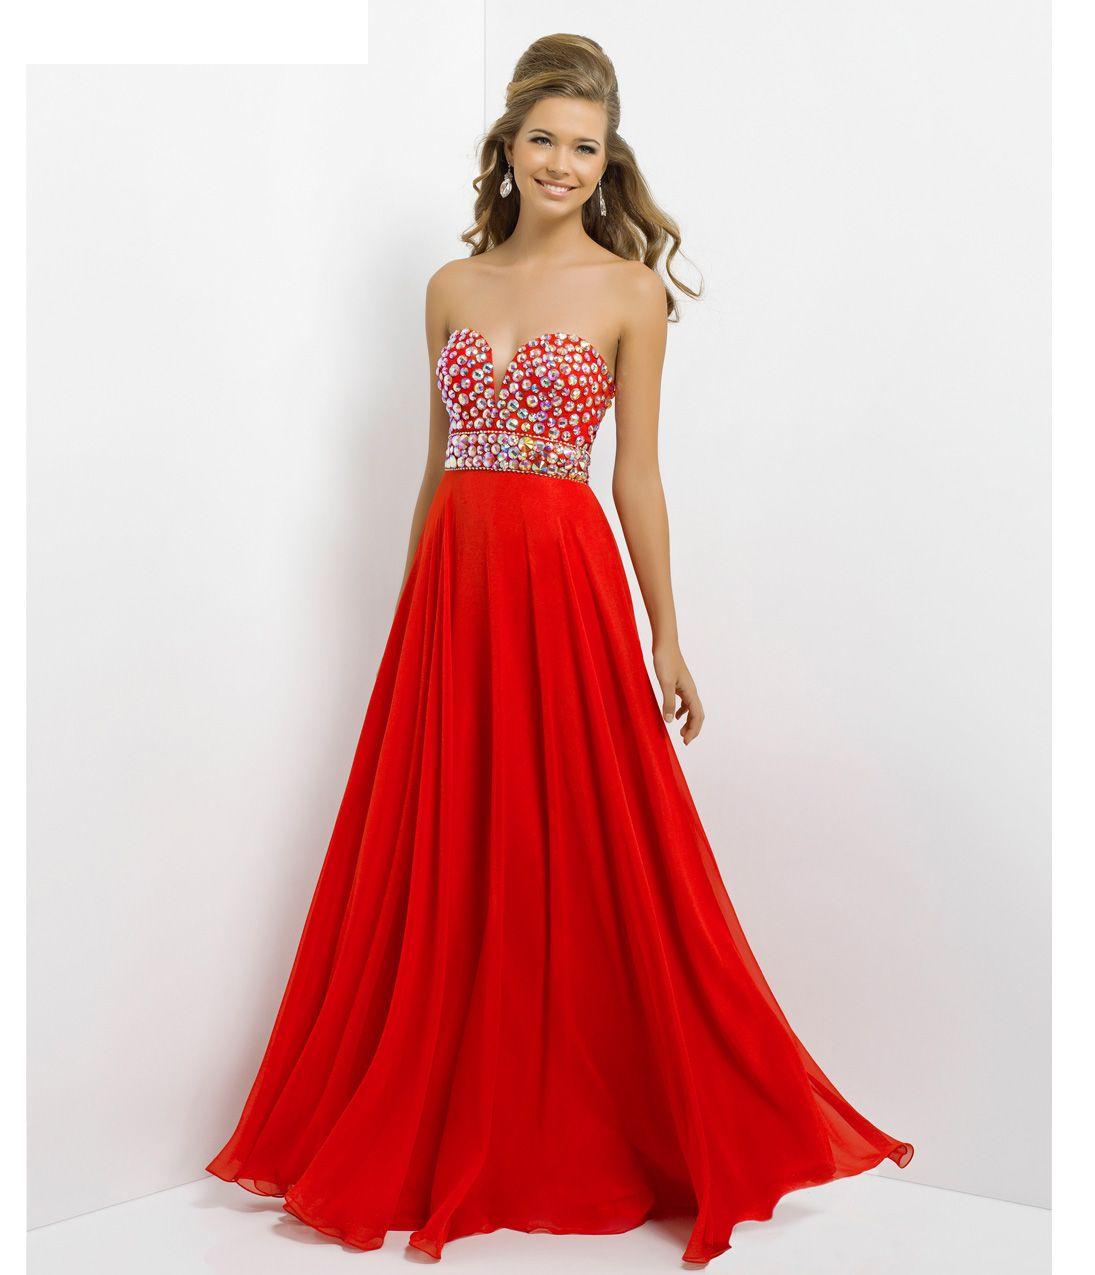 Blush 2014 Prom Dresses - Valentine Sexy V-Neck Long Prom Dress - Unique Vintage